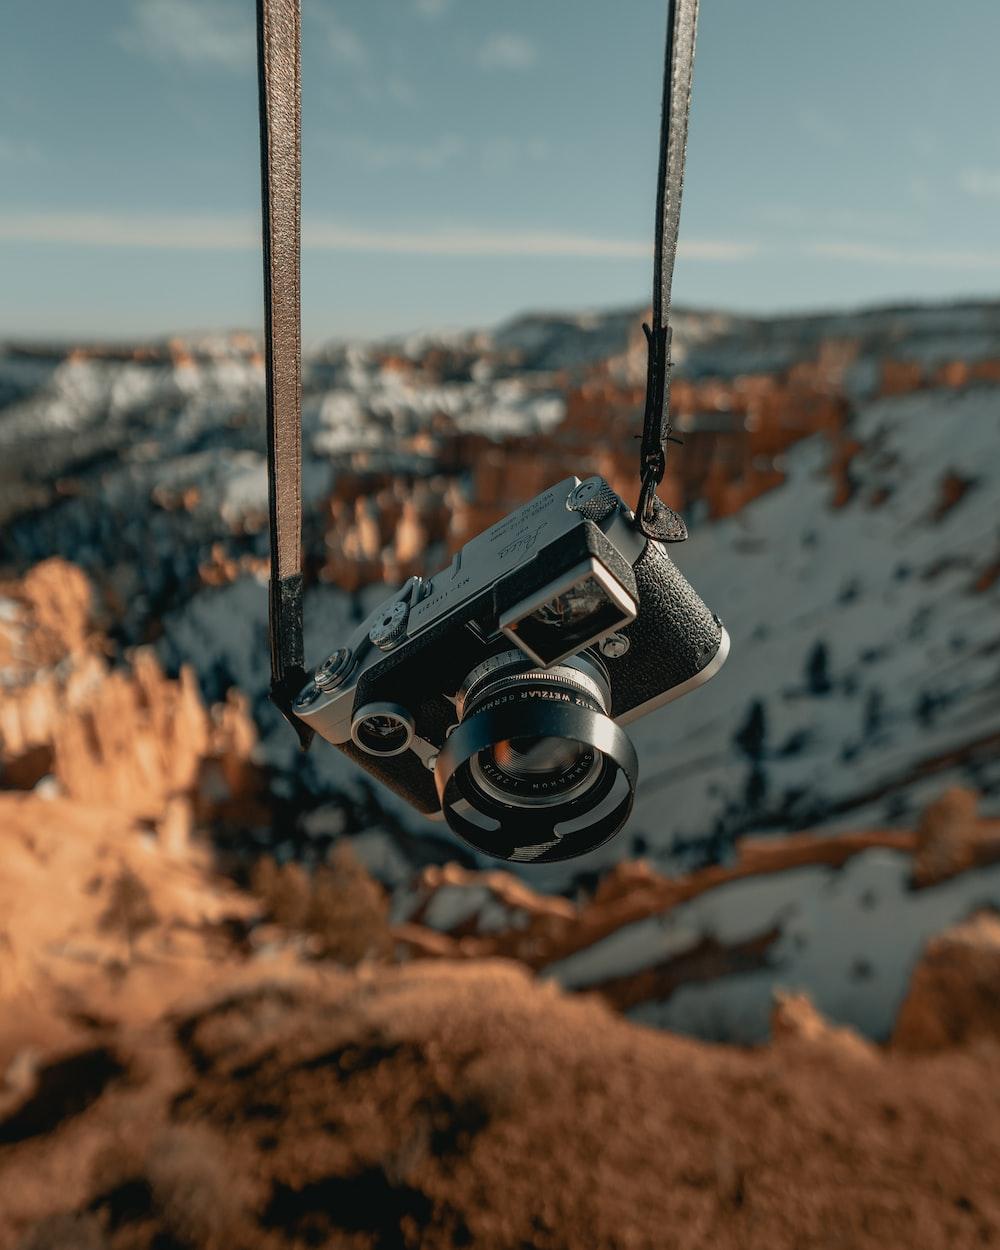 black and silver dslr camera hanging on black rope